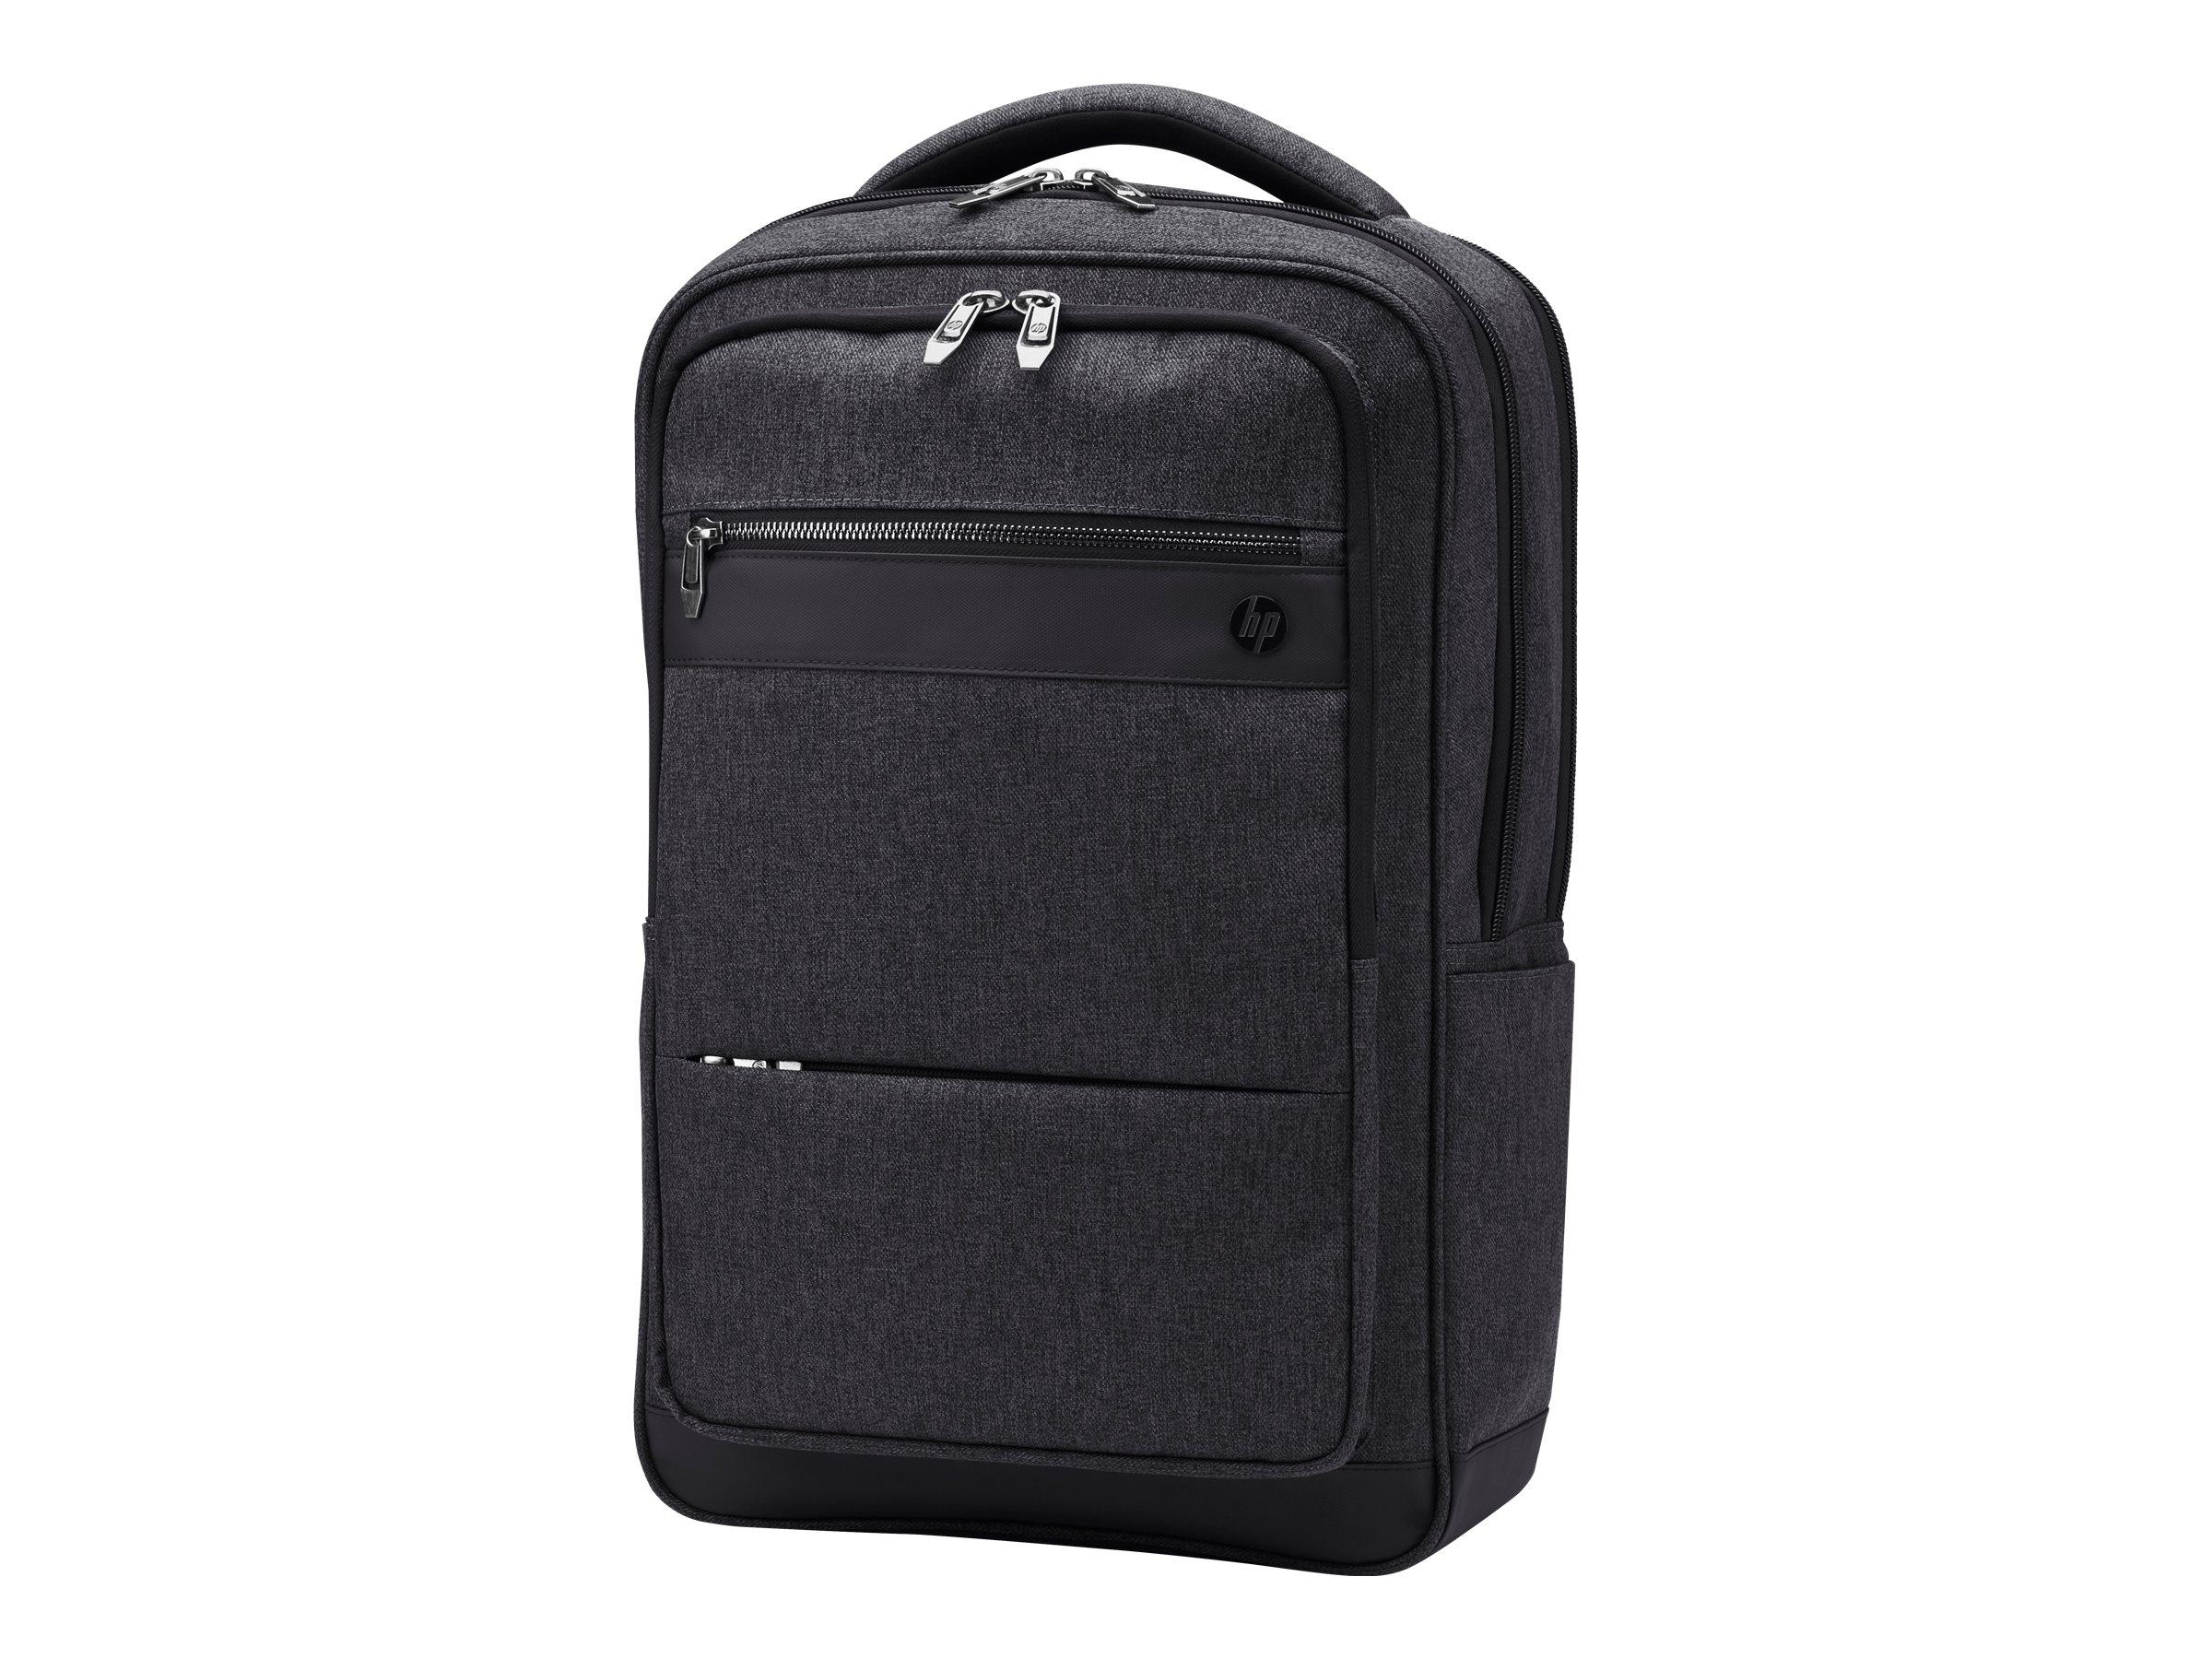 HP Executive Backpack - Notebook-Rucksack - 43.9 cm (17.3